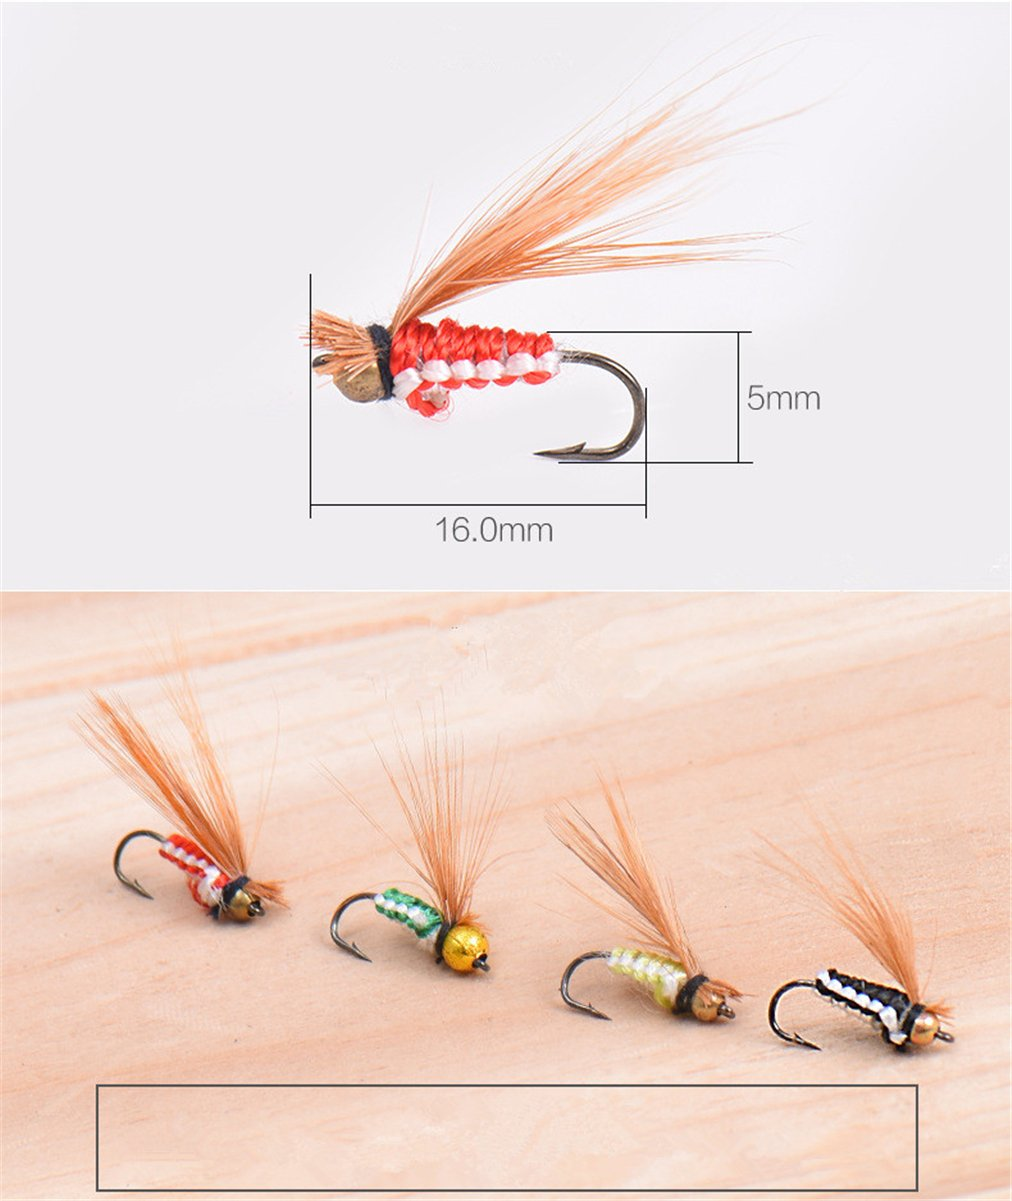 JasCherry 40pcs Fishing Lure Bionic Hooks High Simulation Flies Fish Bait Yellow Flies